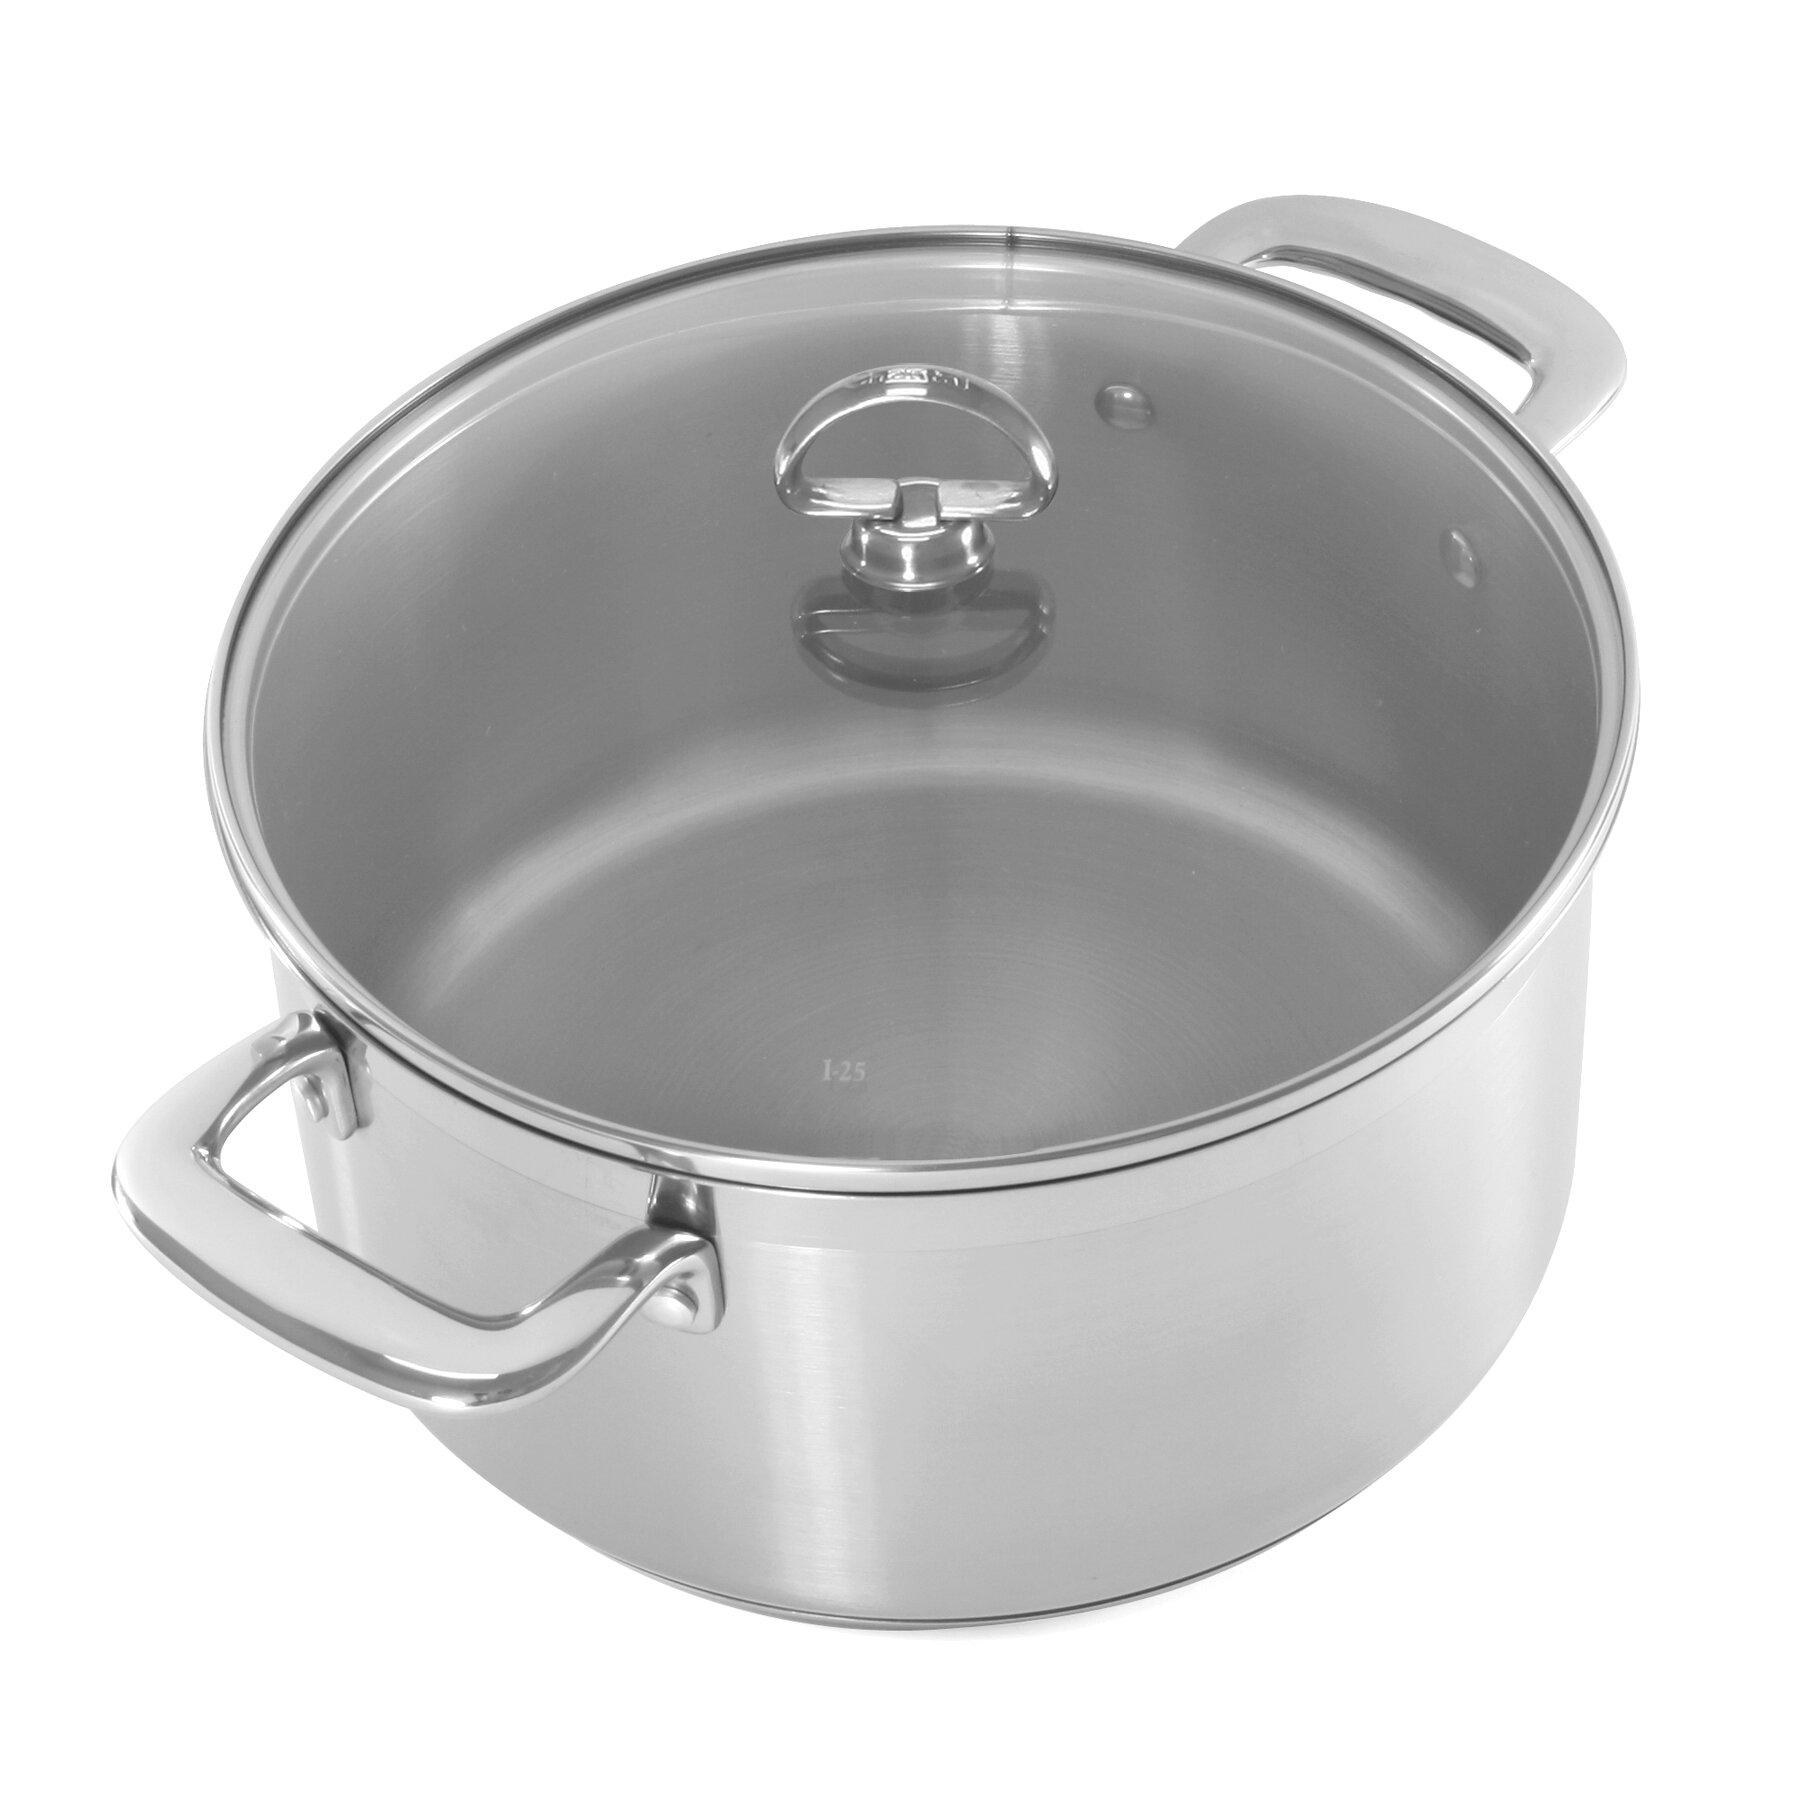 chantal induction 21 steel 6 qt round casserole ebay. Black Bedroom Furniture Sets. Home Design Ideas